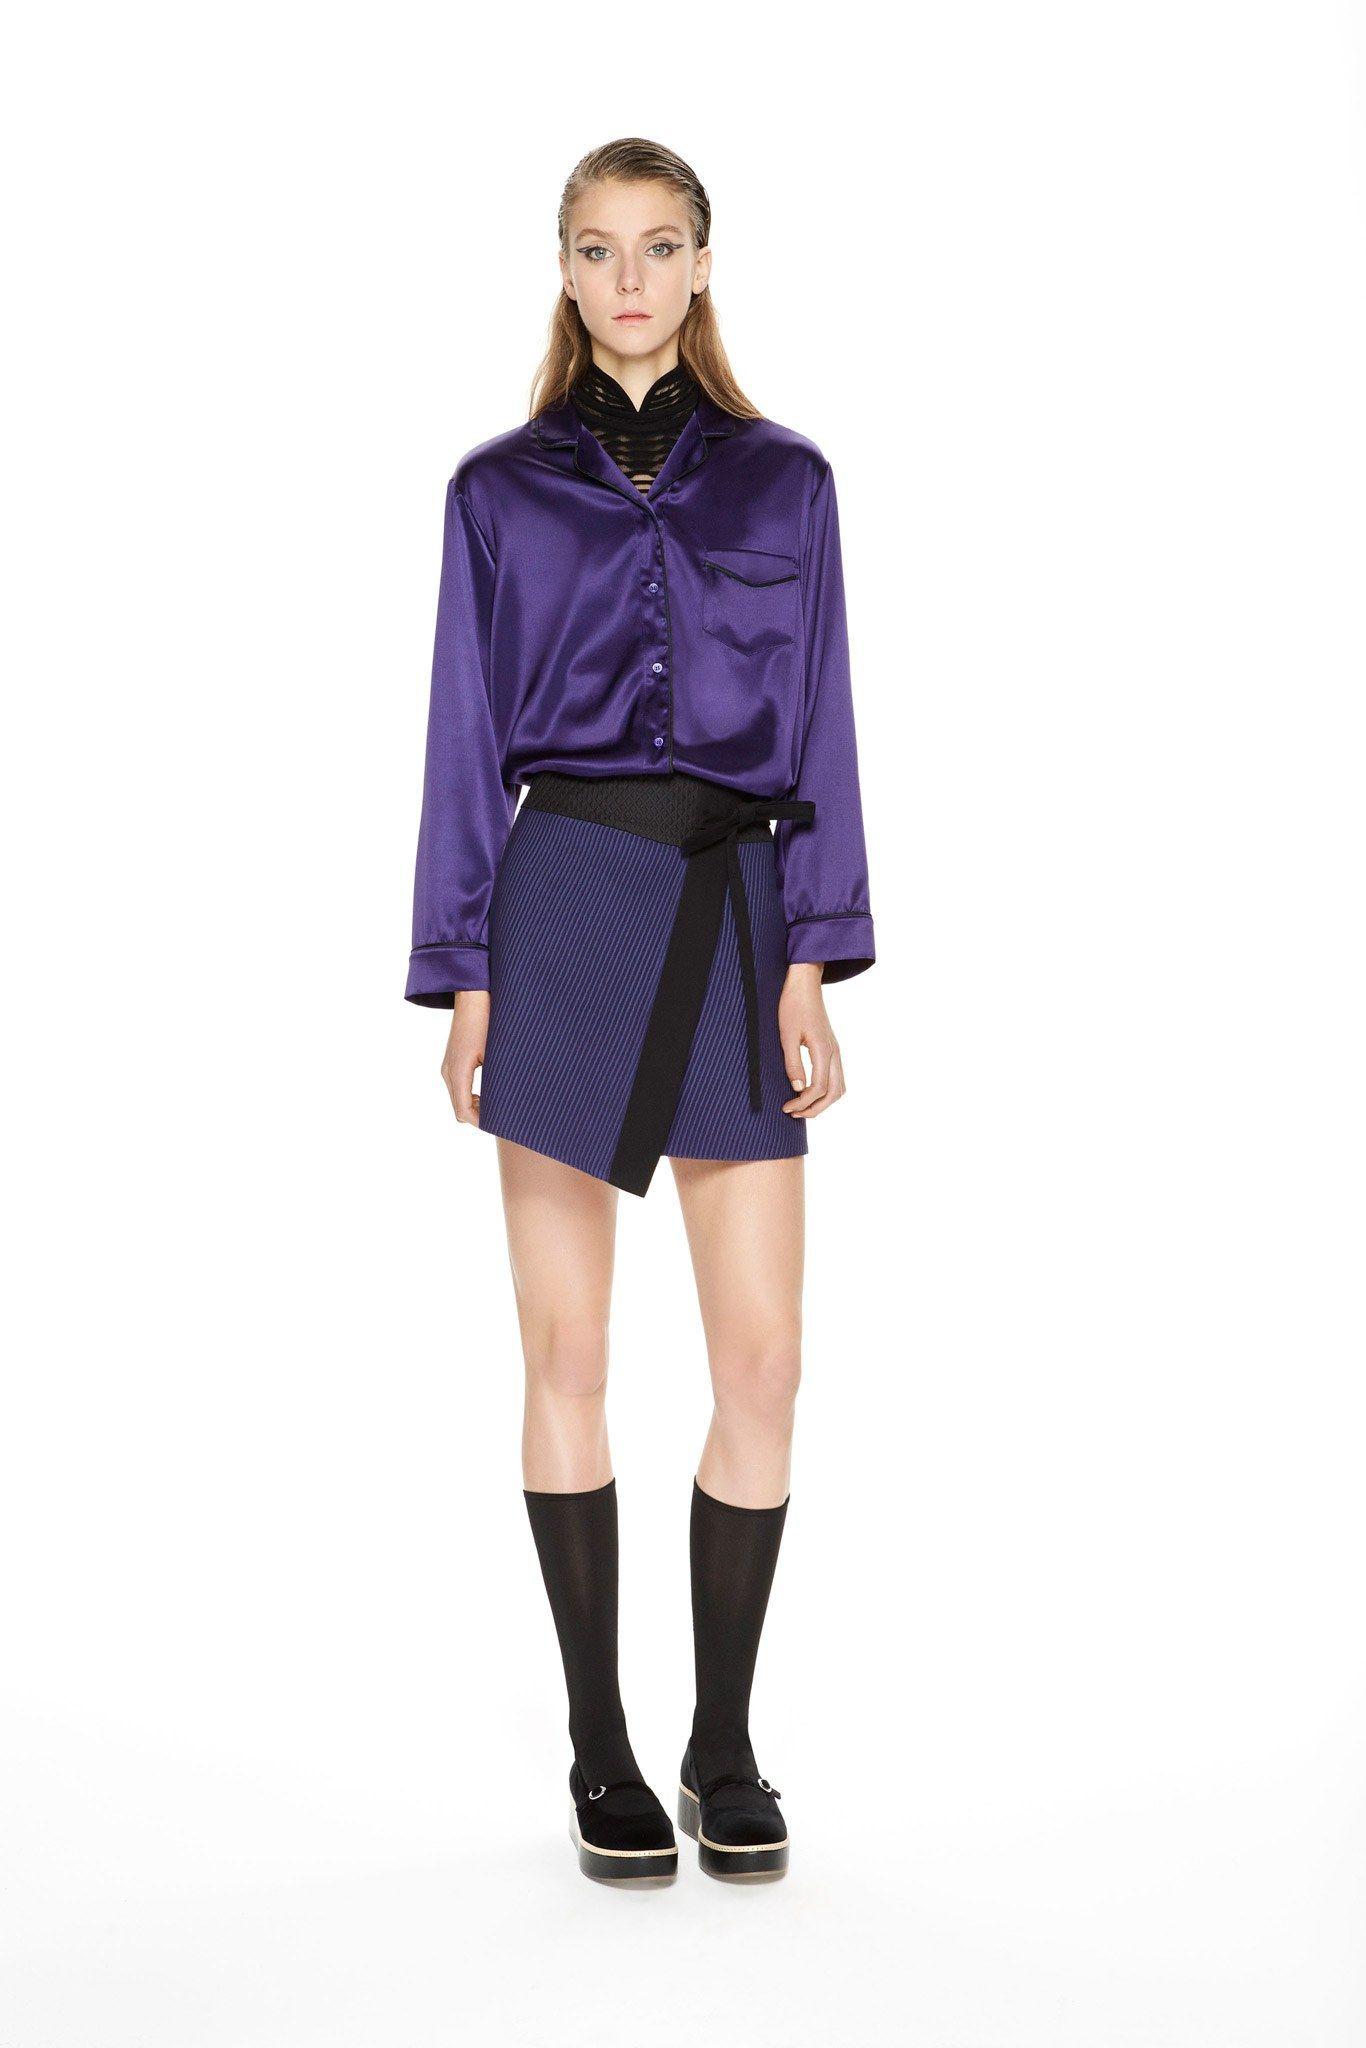 M Missoni Fall 2015 Ready-to-Wear Fashion Show Look 4